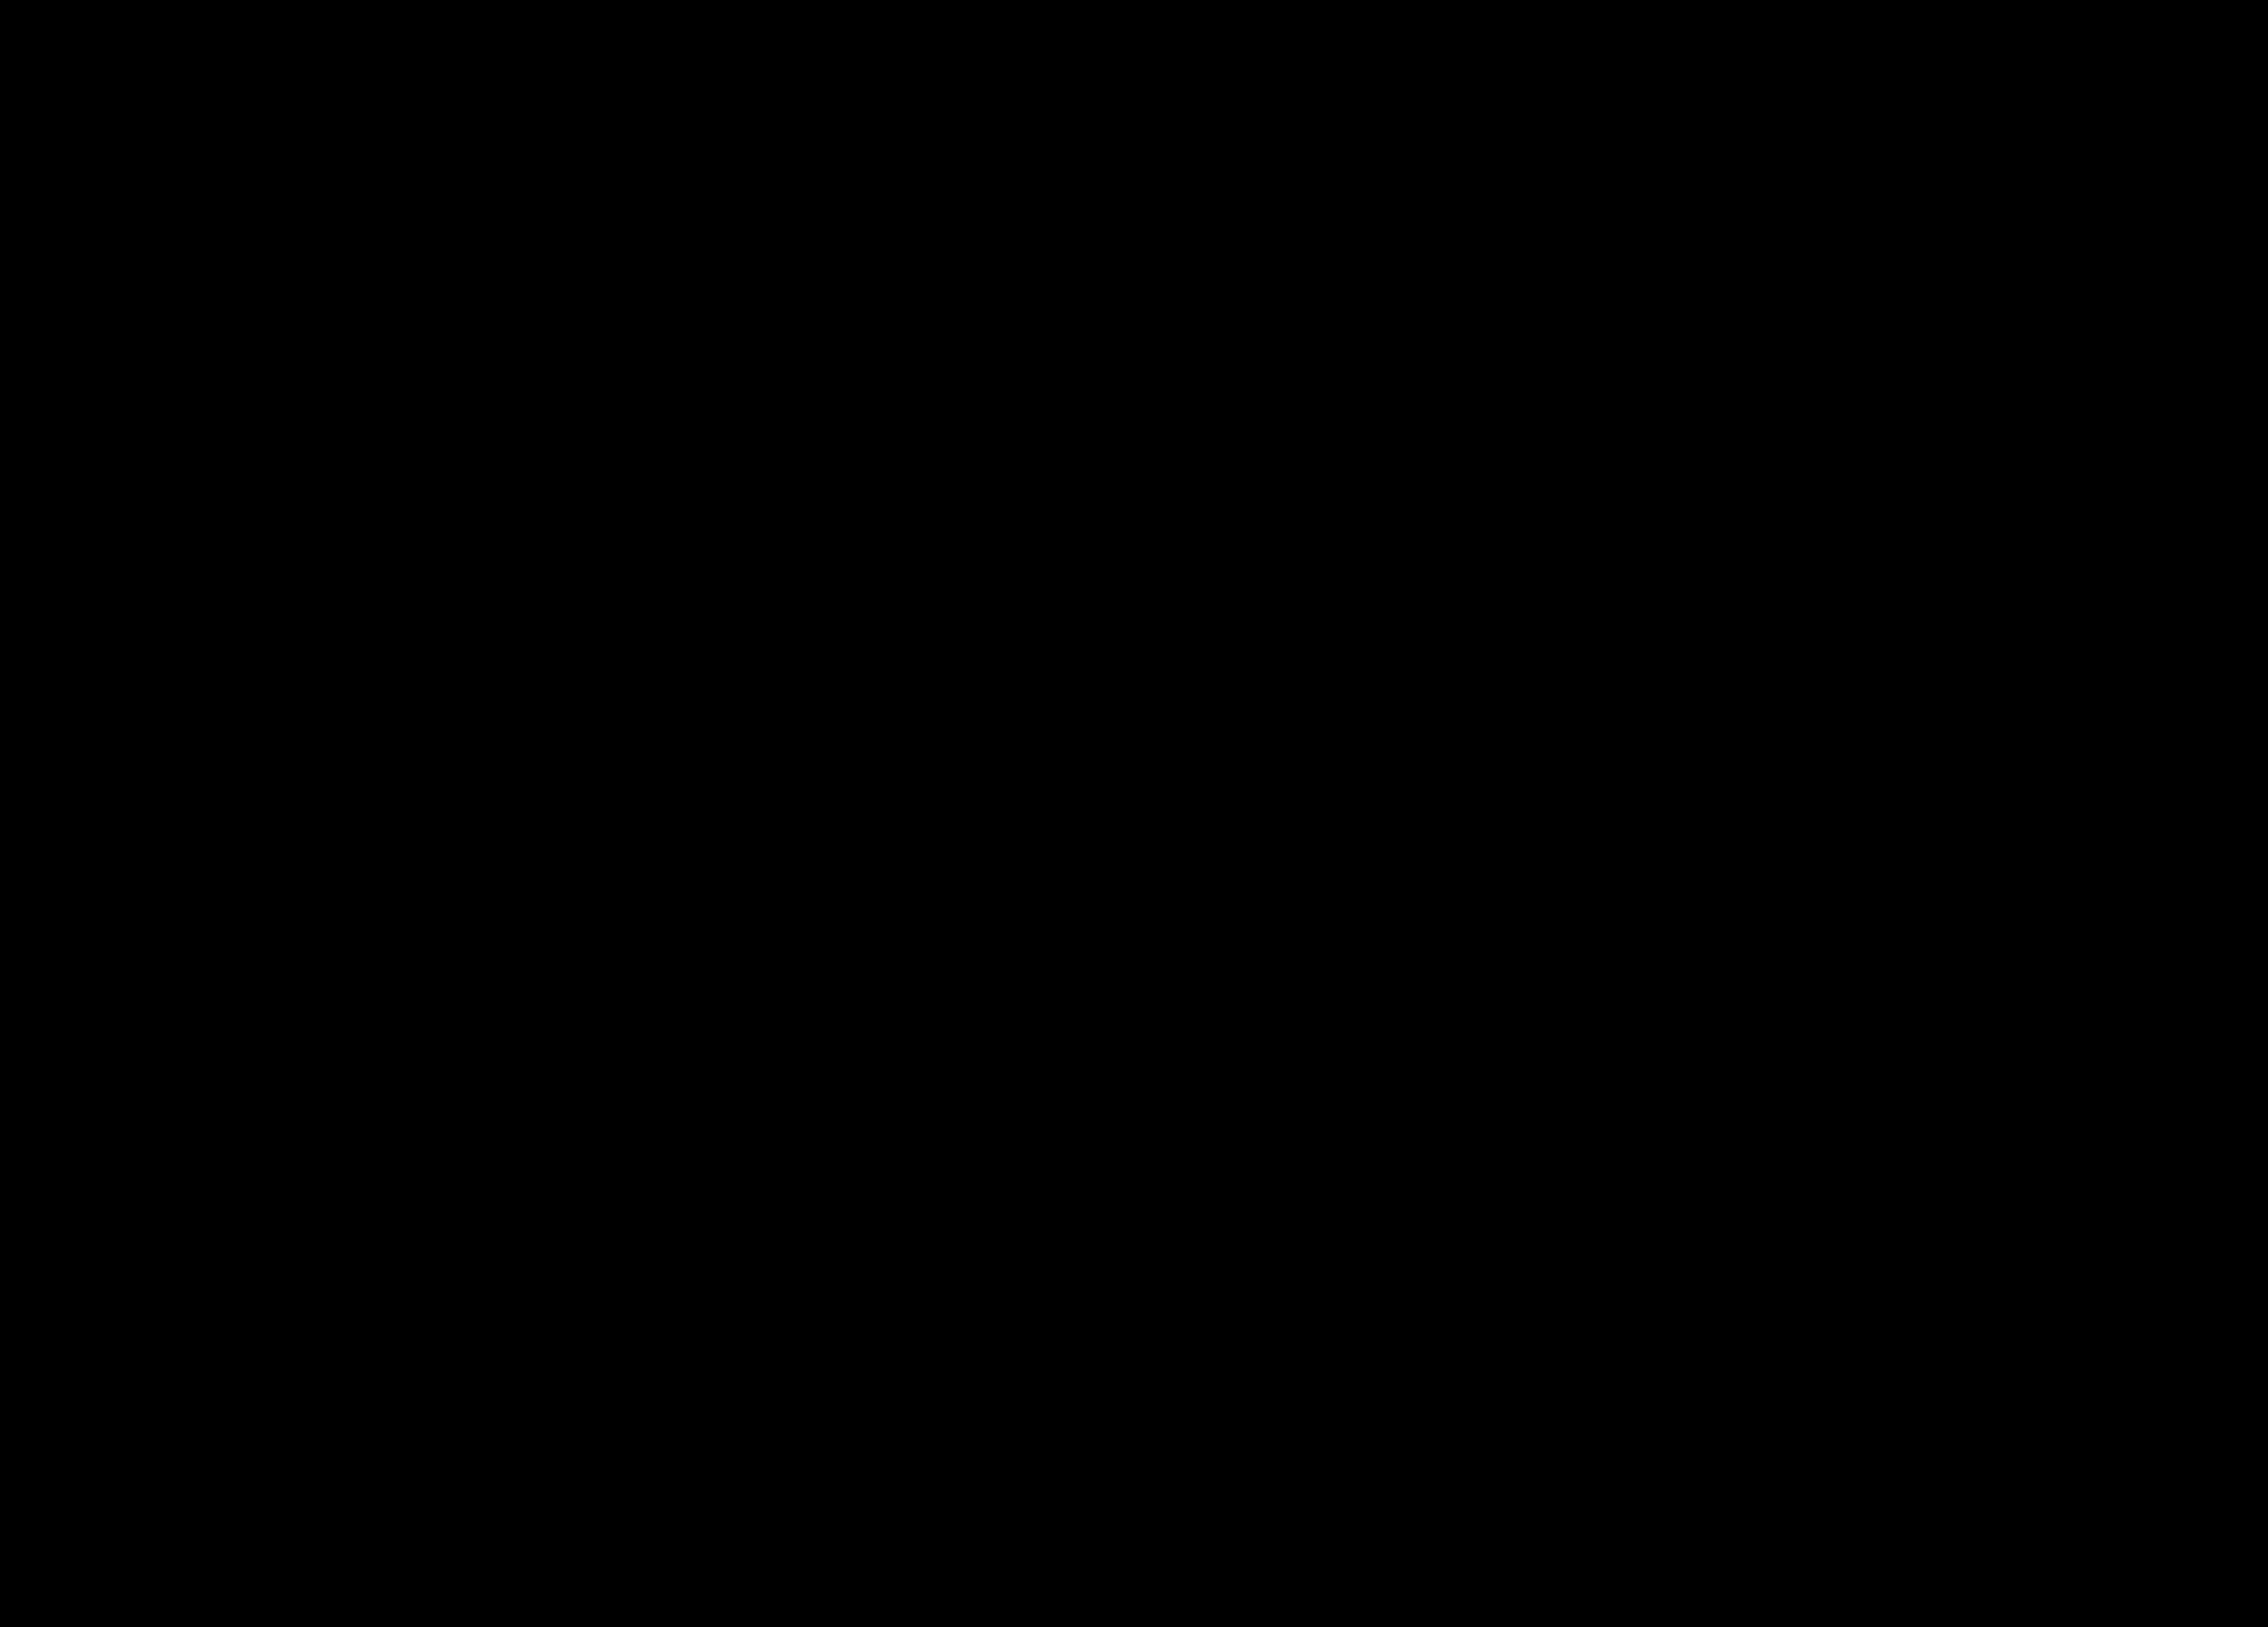 6 Grunge Dots Overlay (PNG Transparent) | OnlyGFX com